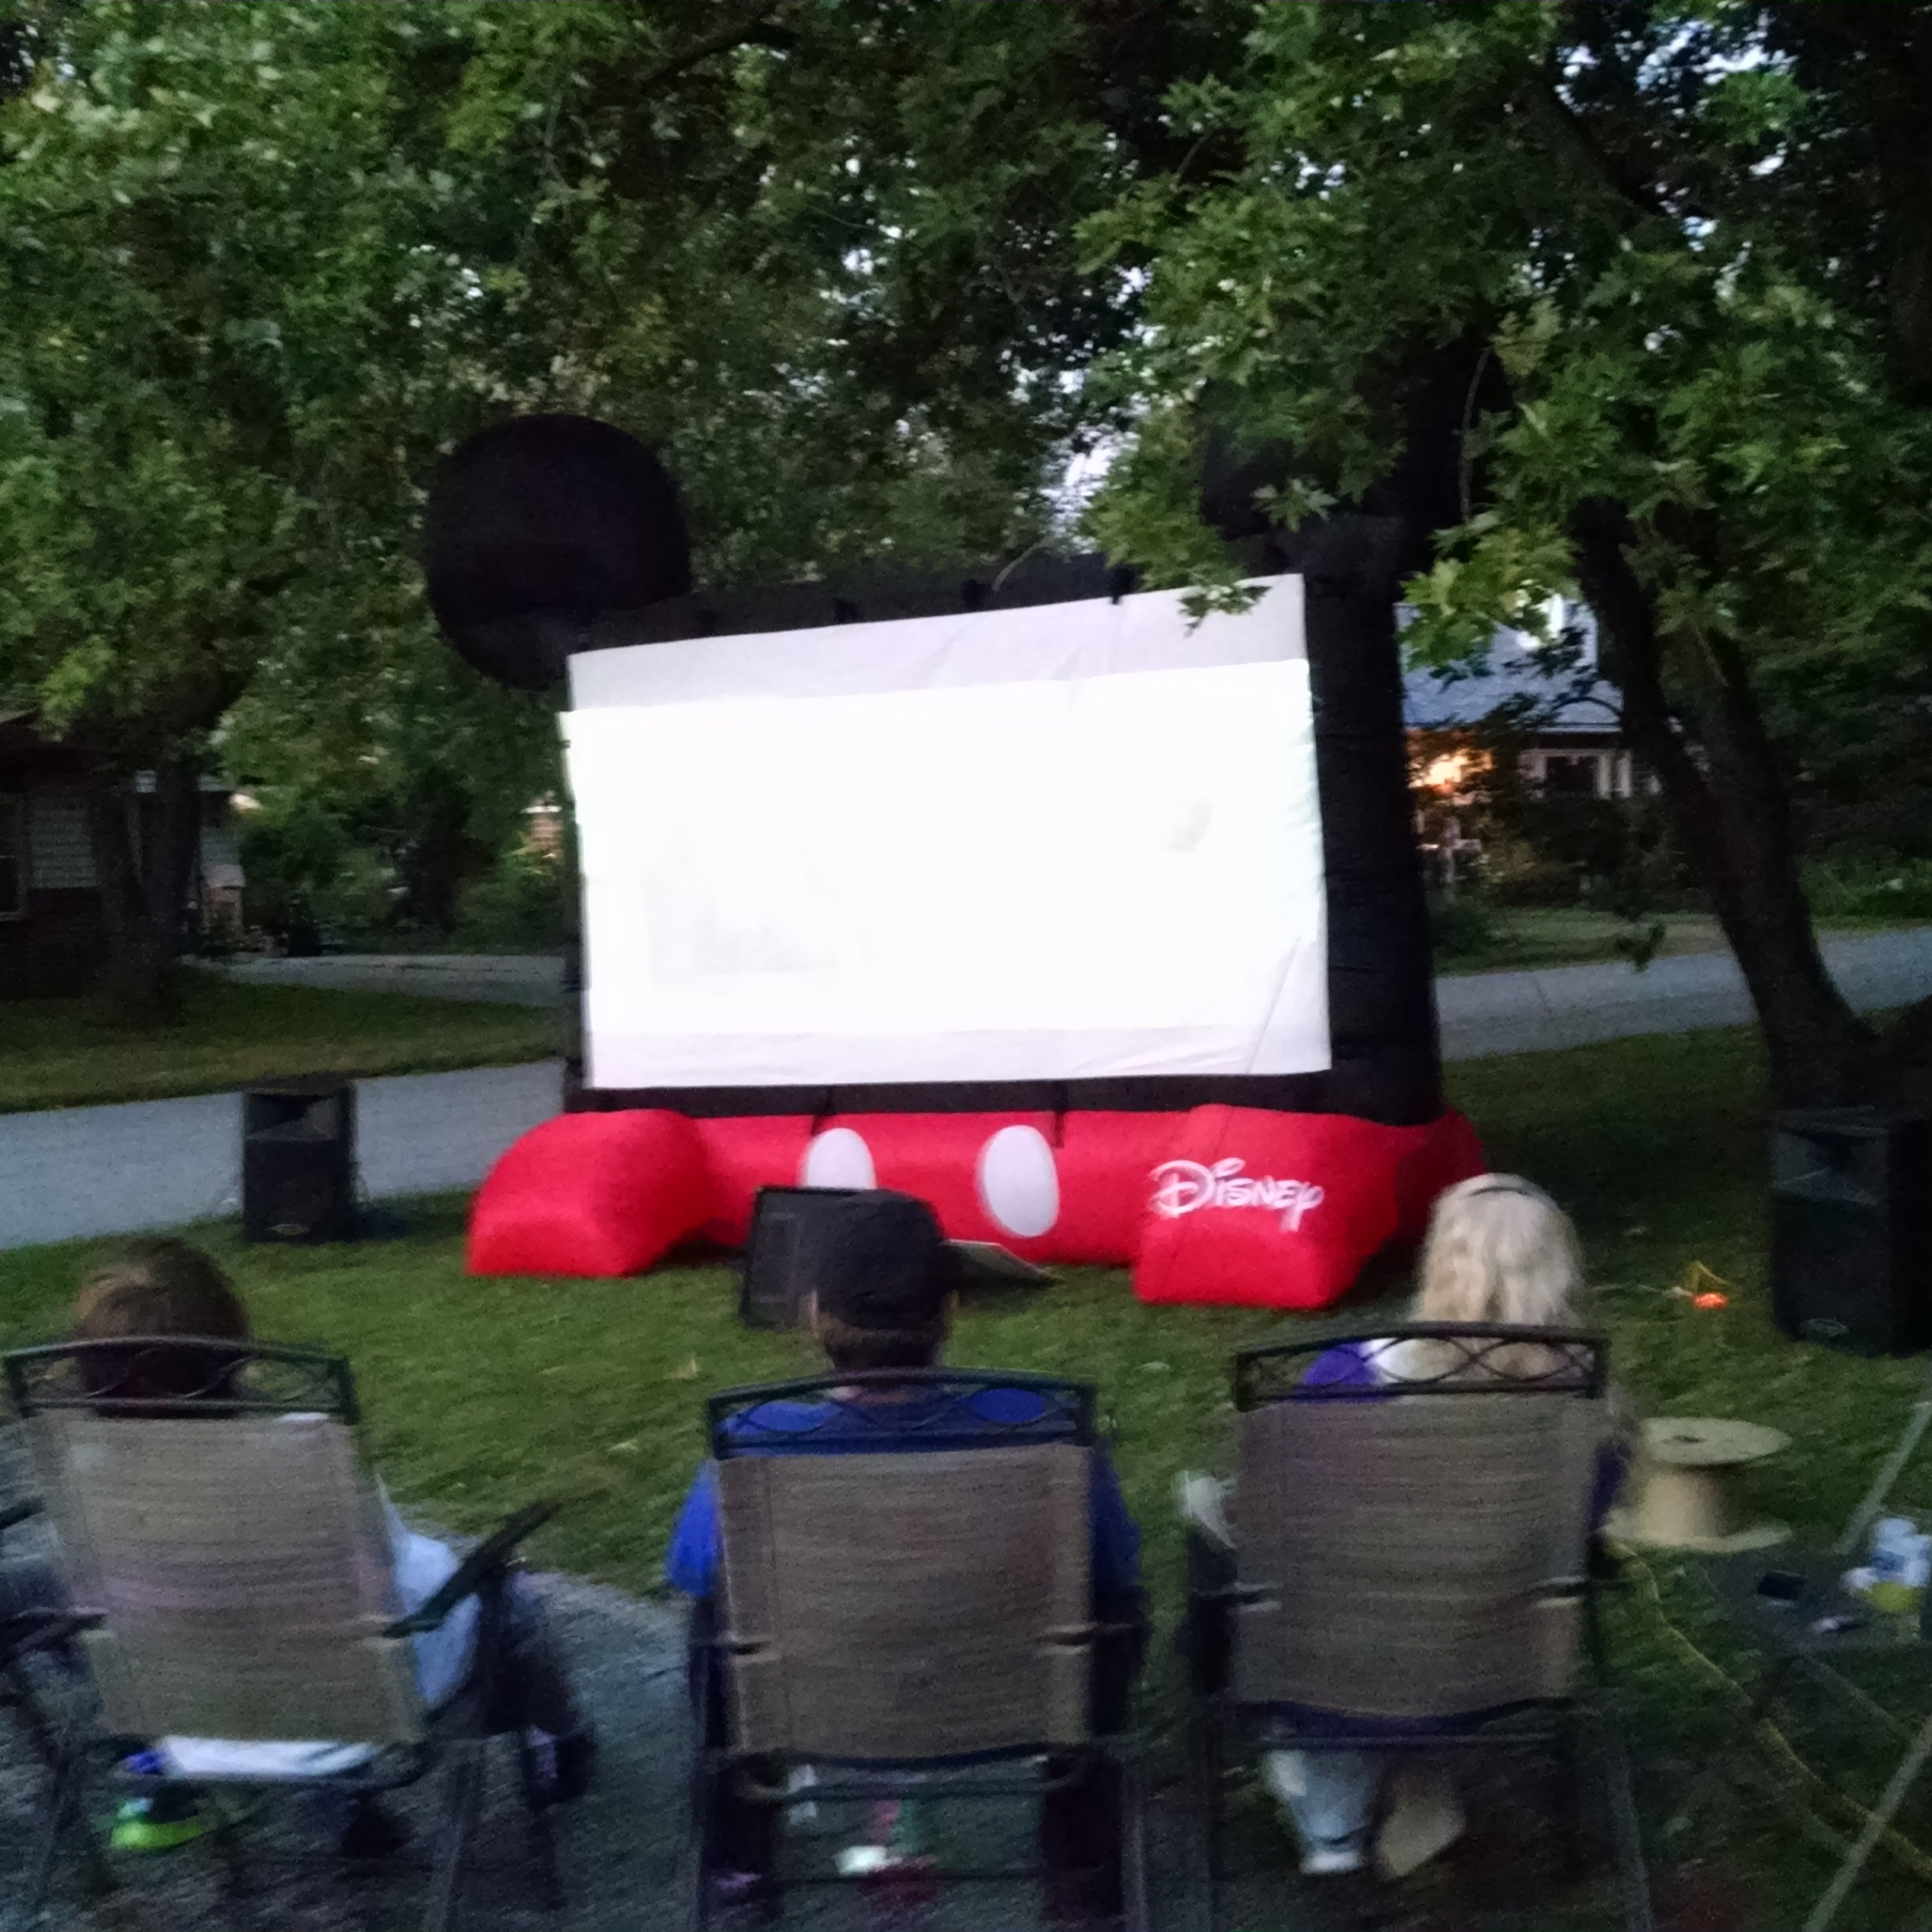 indy big screen indoor outdoors movie screen projection